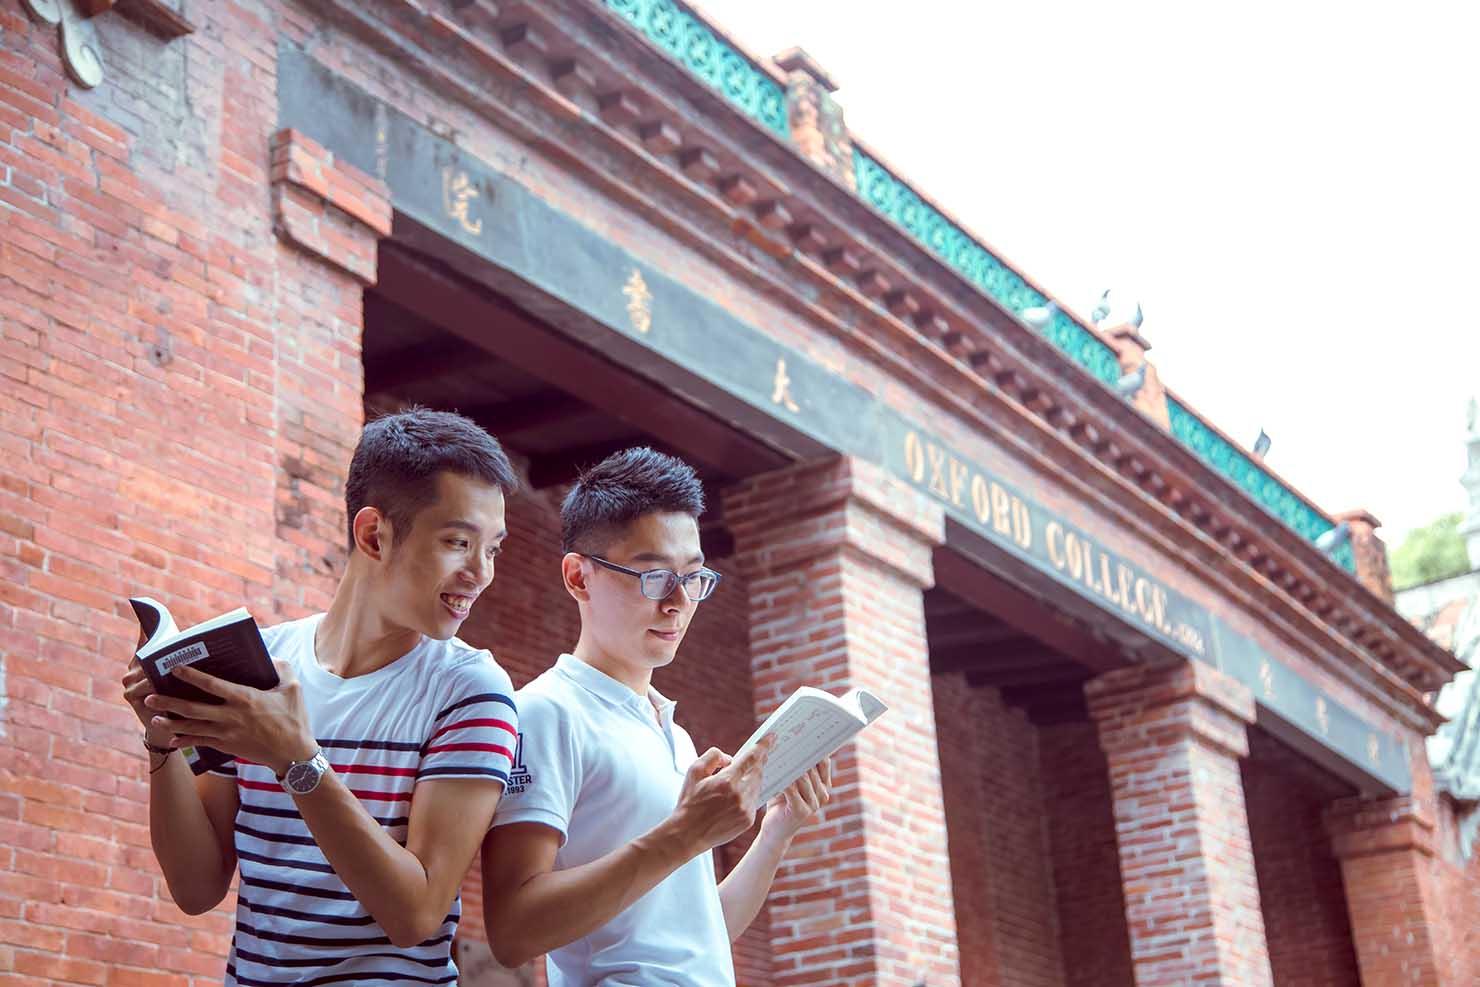 KKday台湾旅行・出張撮影サービス撮影サンプル(レンガ造りの建物前に立つ2人)